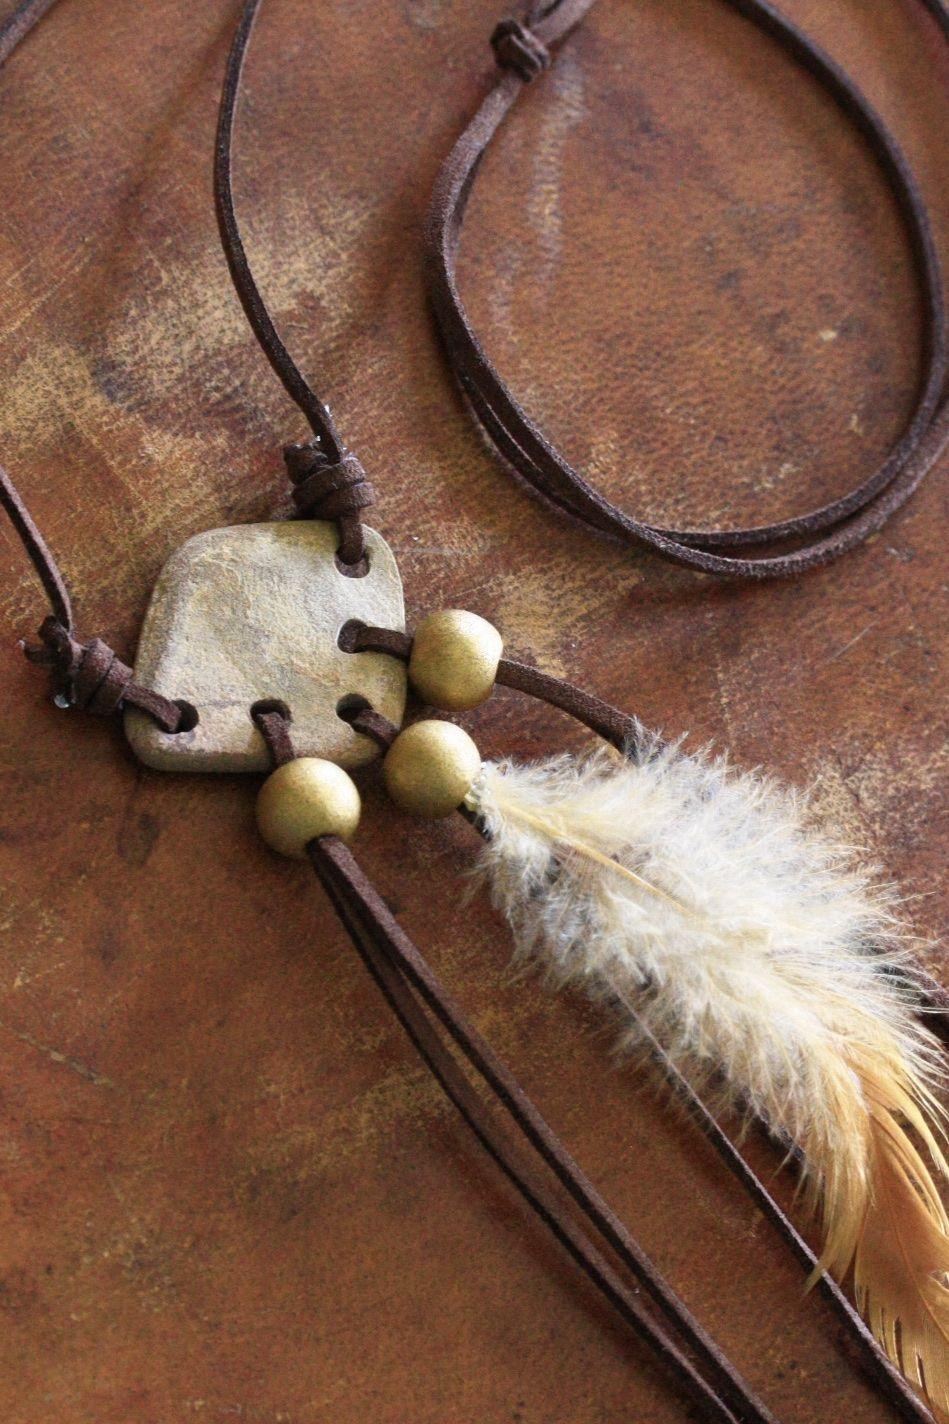 Boho necklace, boho pendant, hippie necklace, sea found pottery, sea found ceramic, ceramic necklace, feather necklace, boho jewelry